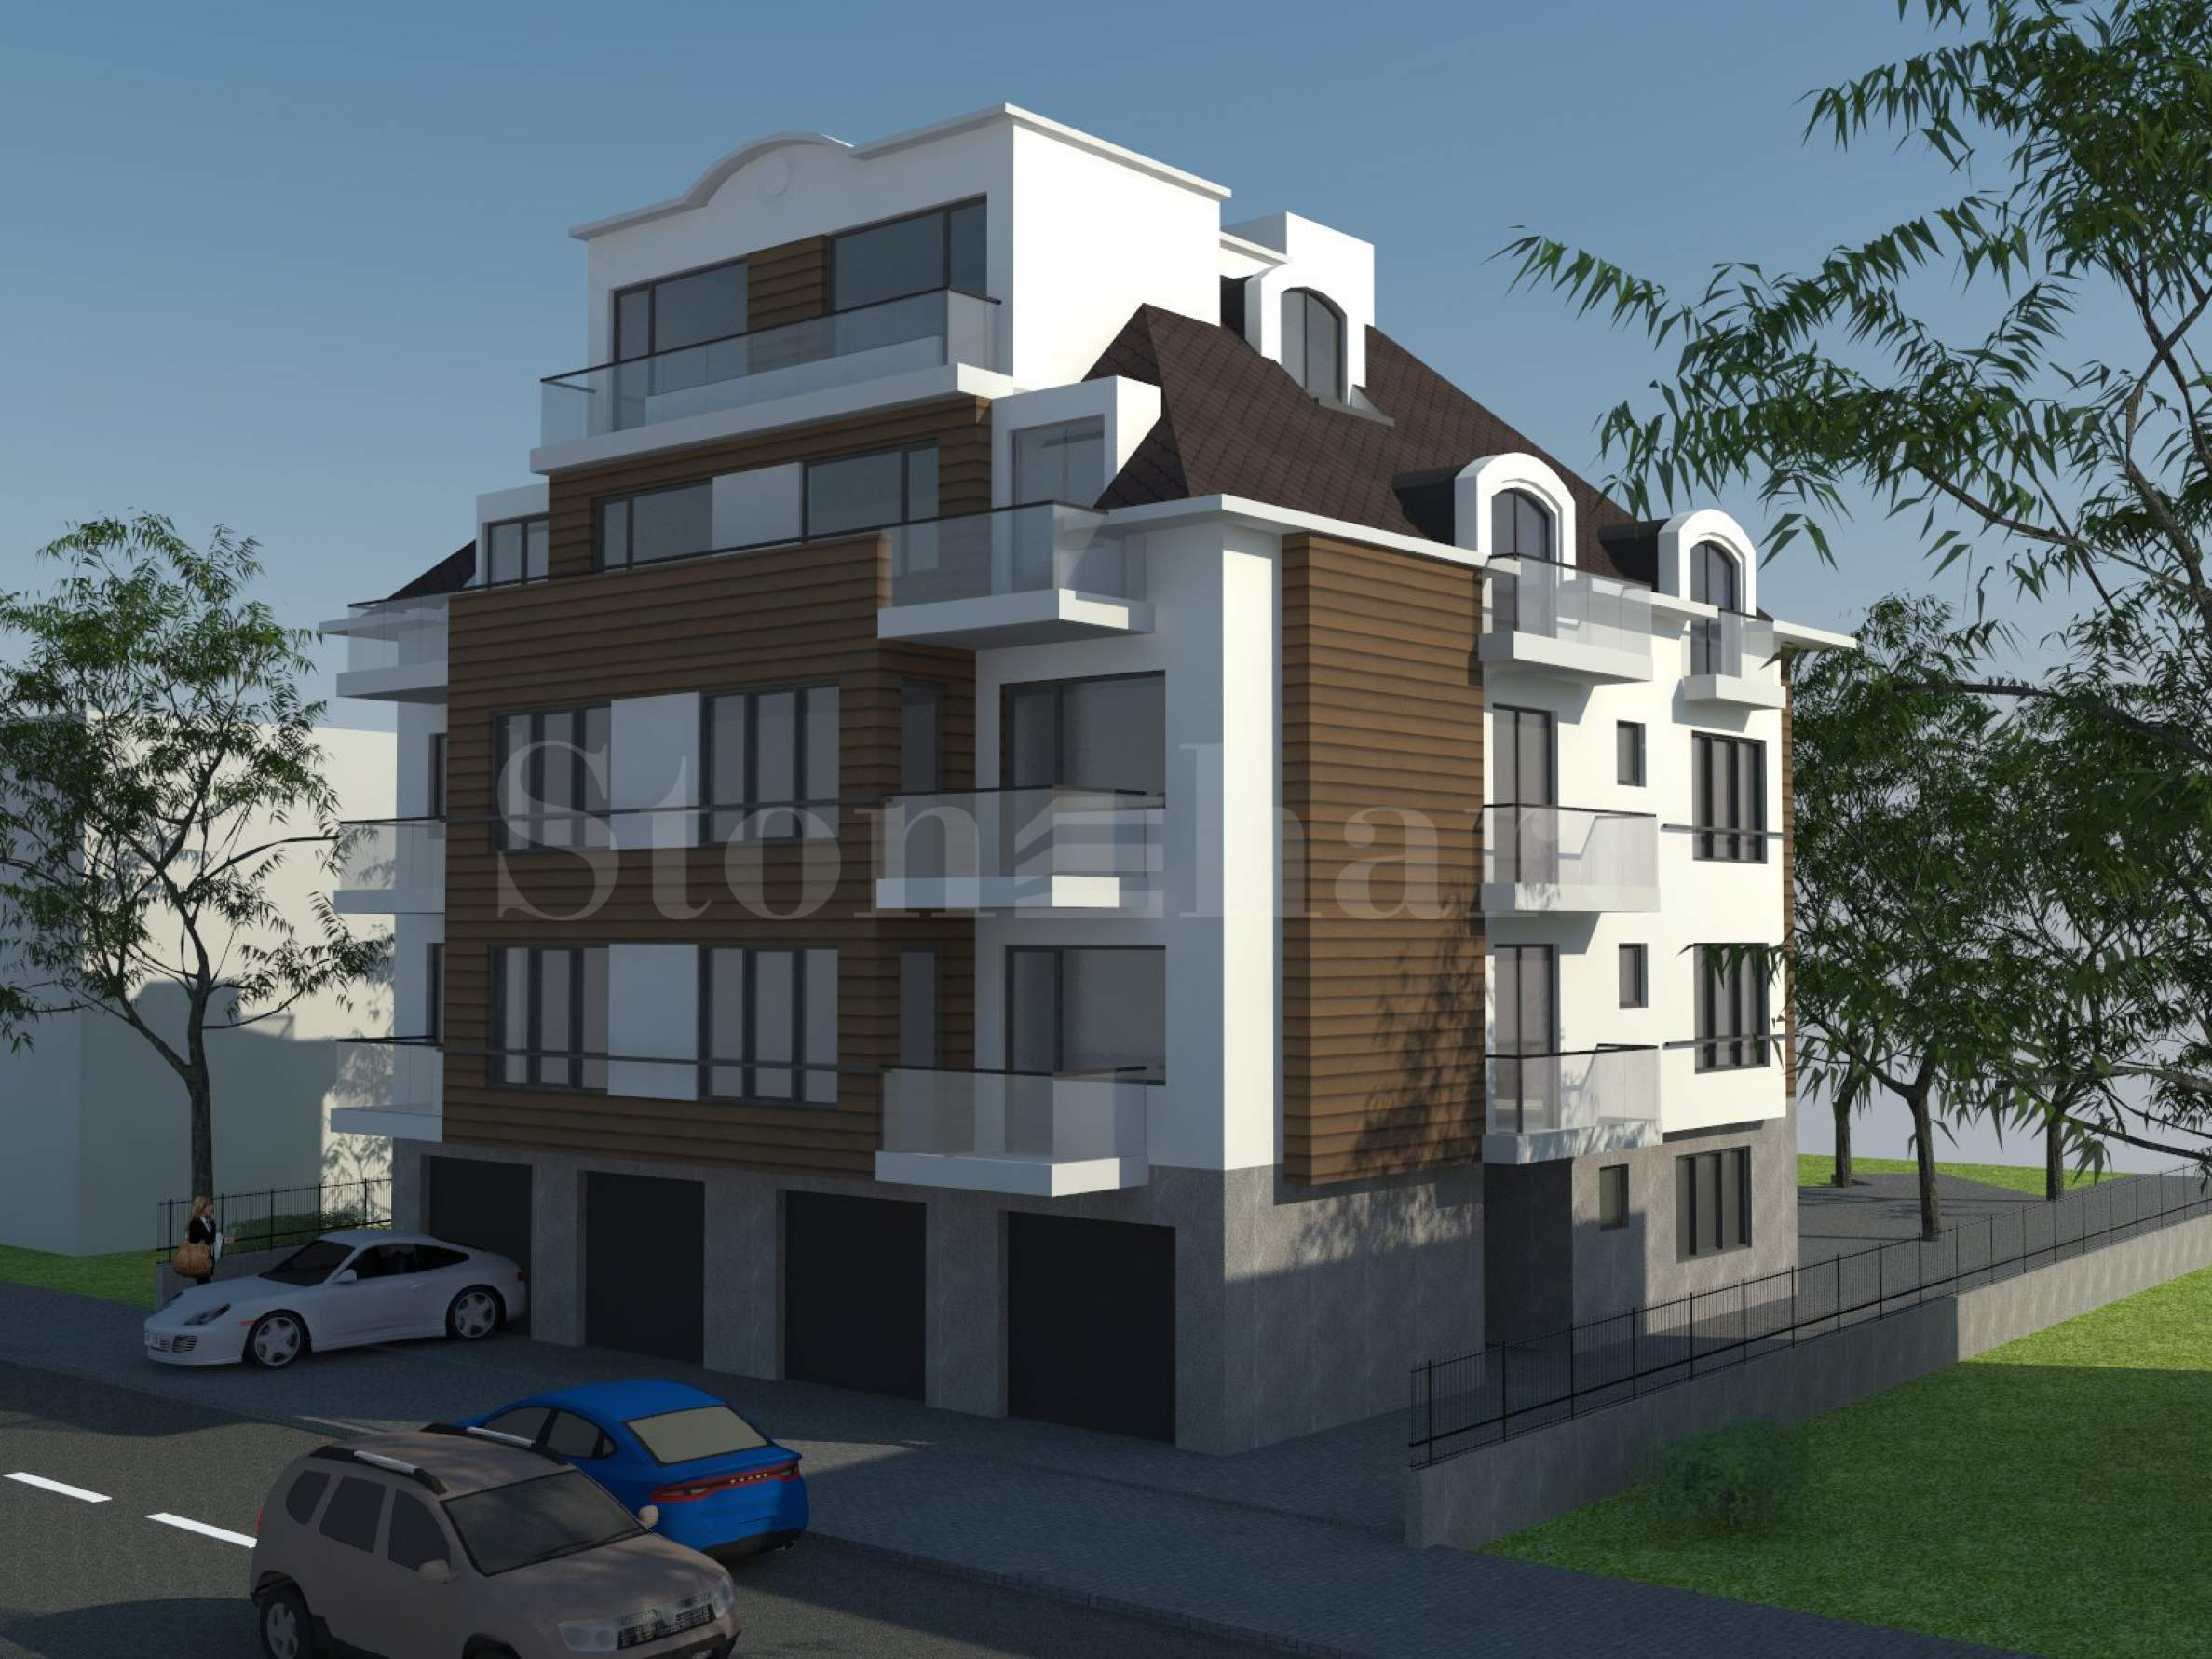 Stylish apartment building on Cherni Vrah Blvd, Krastova Vada District2 - Stonehard